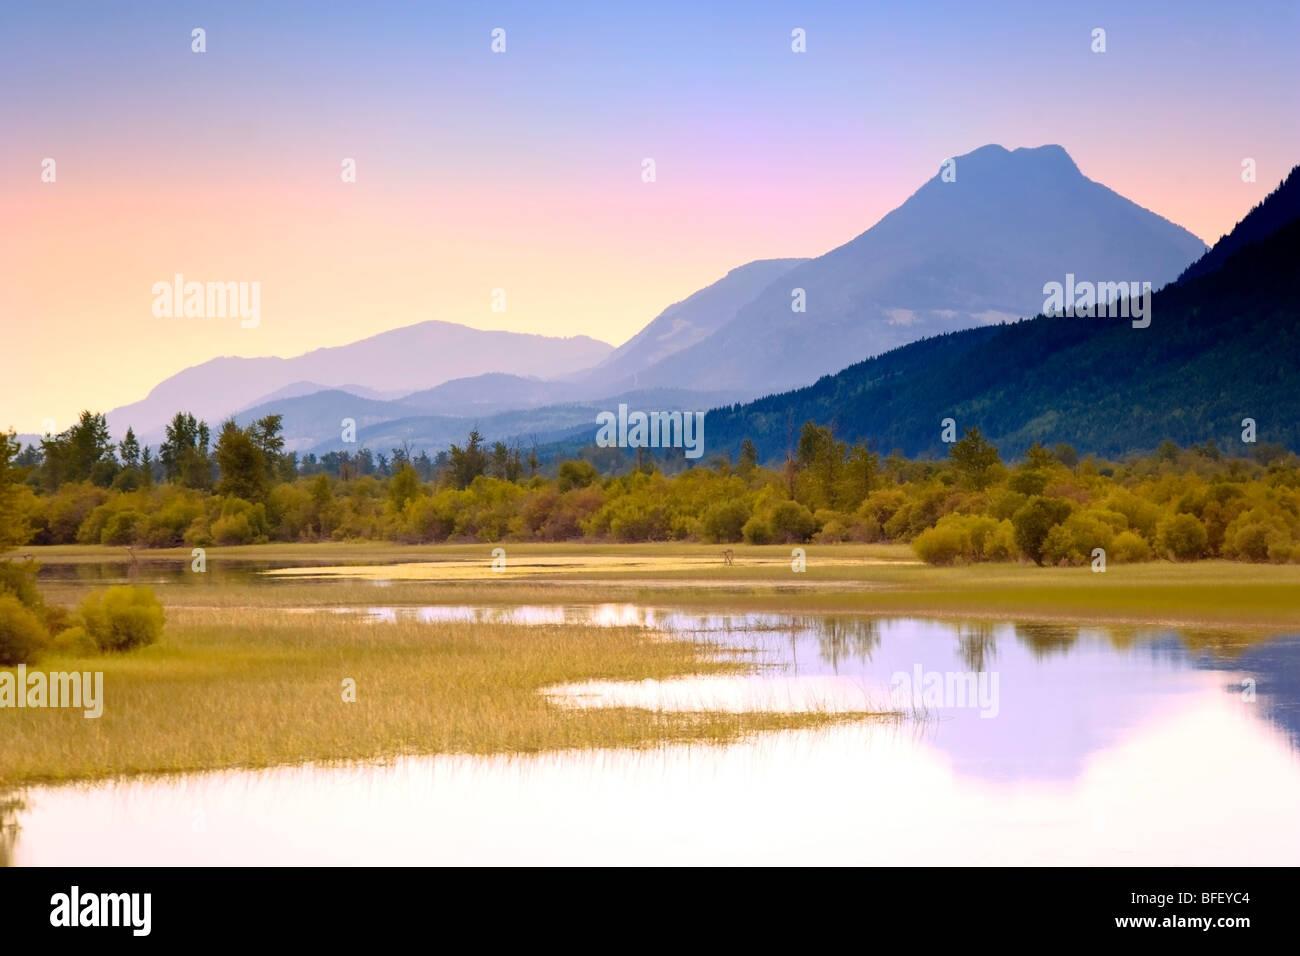 Dans la montagne lac, Harrogan, Colombie-Britannique, Canada Photo Stock